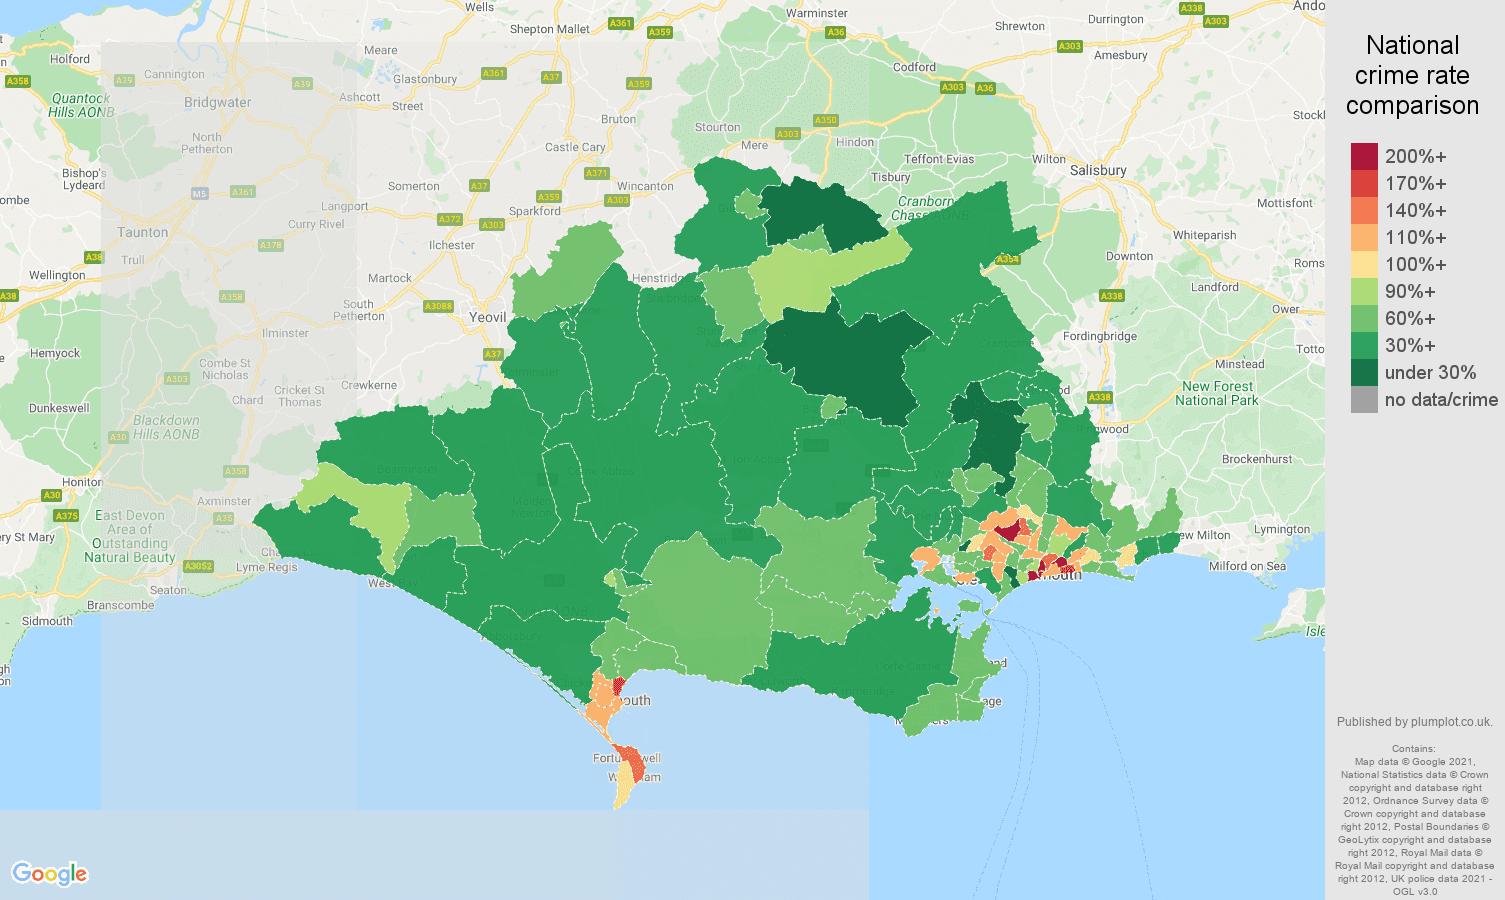 Dorset violent crime rate comparison map